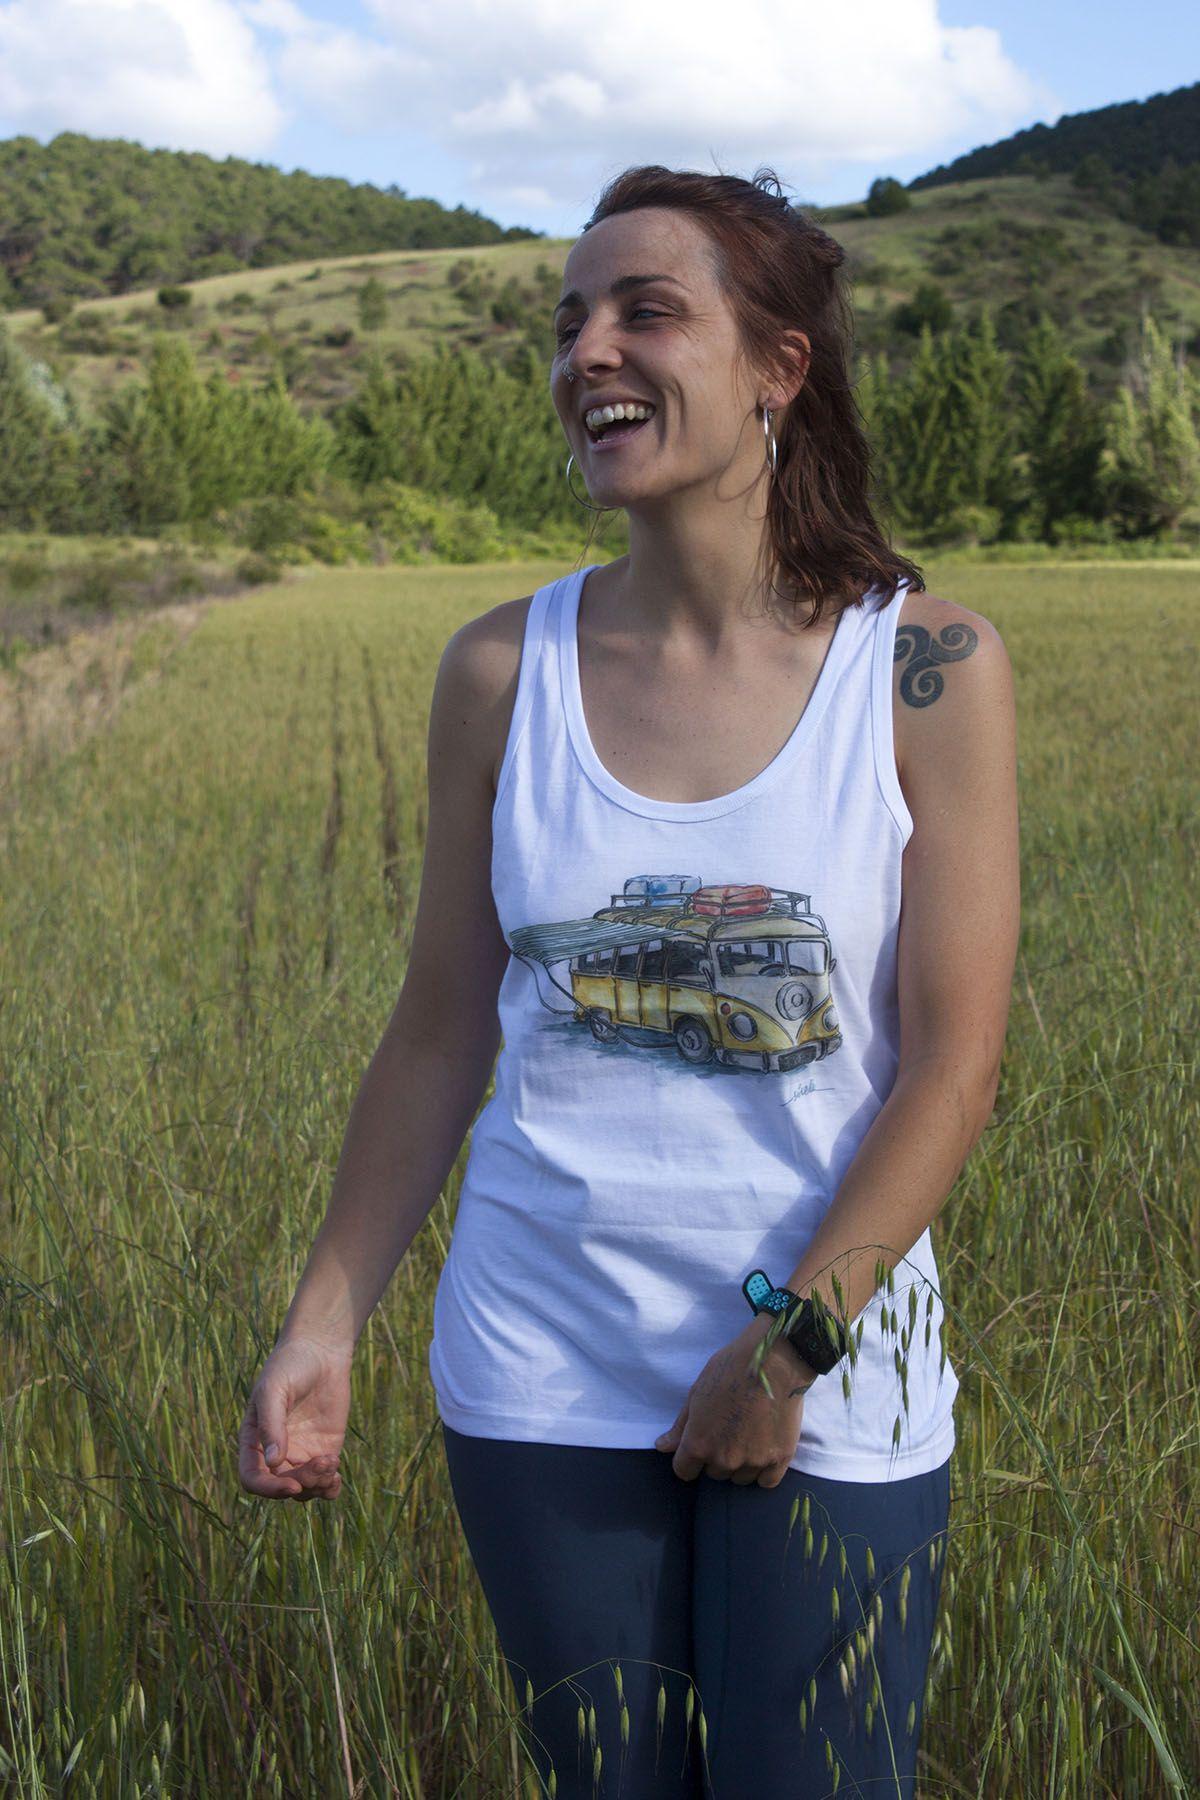 camiseta-furgoneta camper volkswagen-algodon organico-sirem wild-moda etica sostenible-mujer tirantes